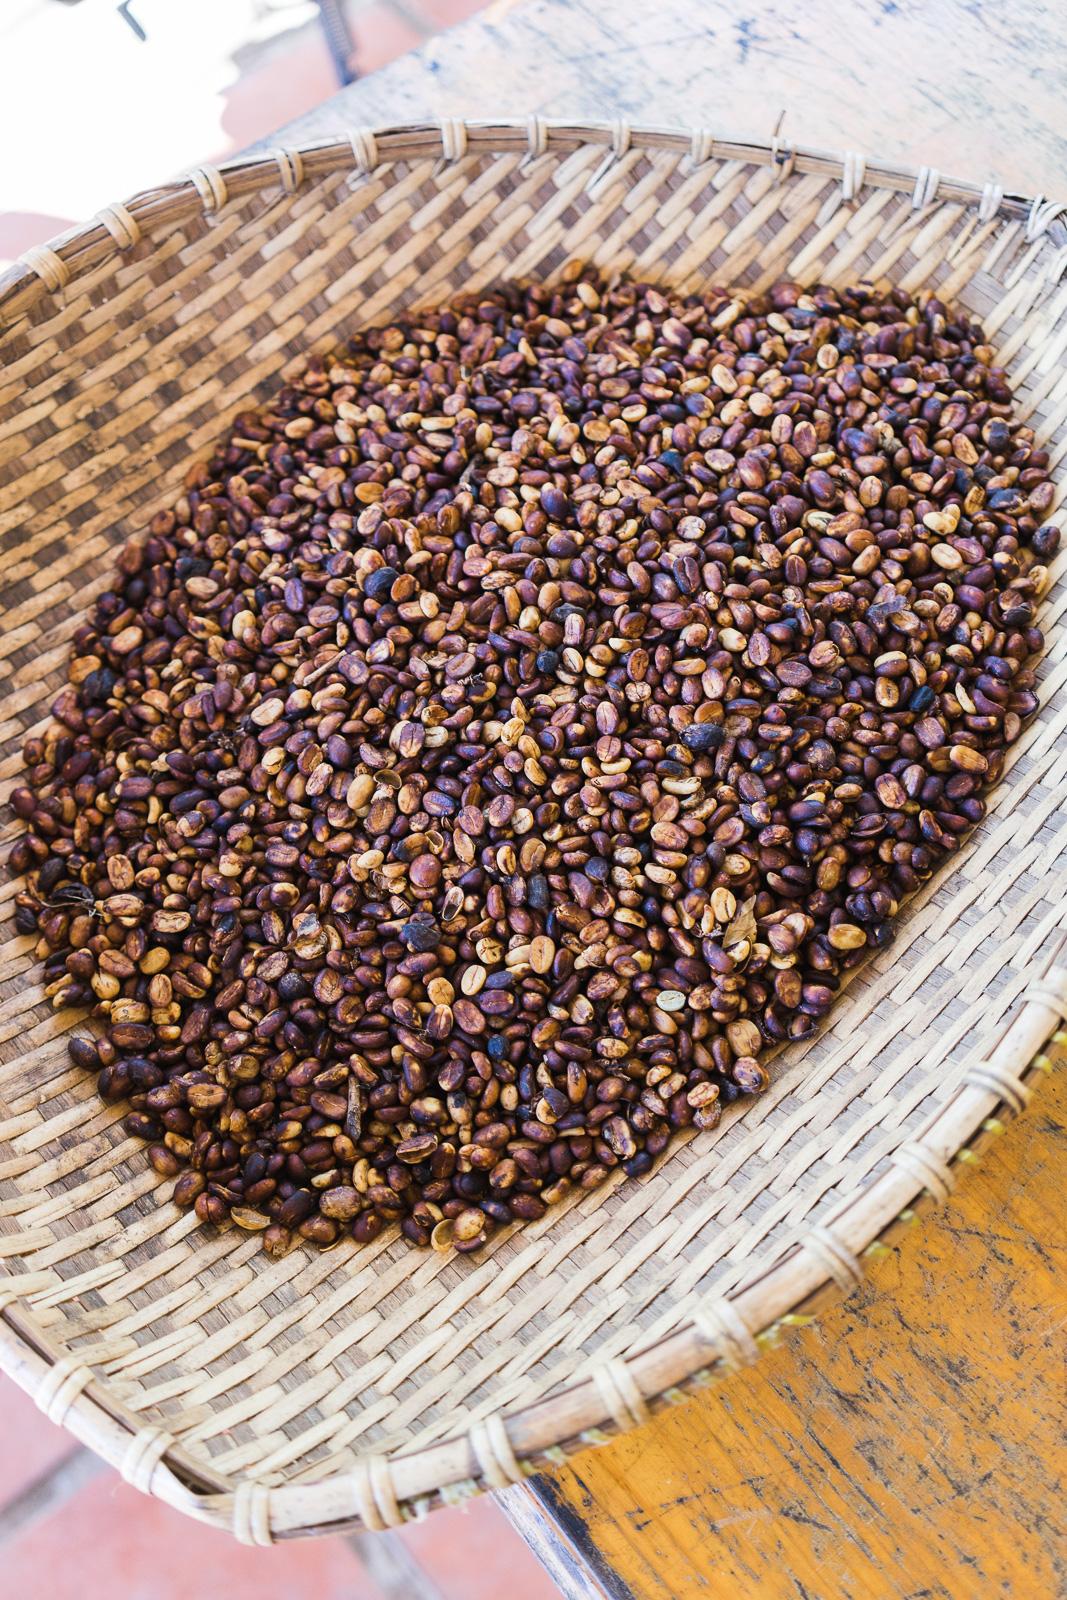 K'Ho Coffee beans